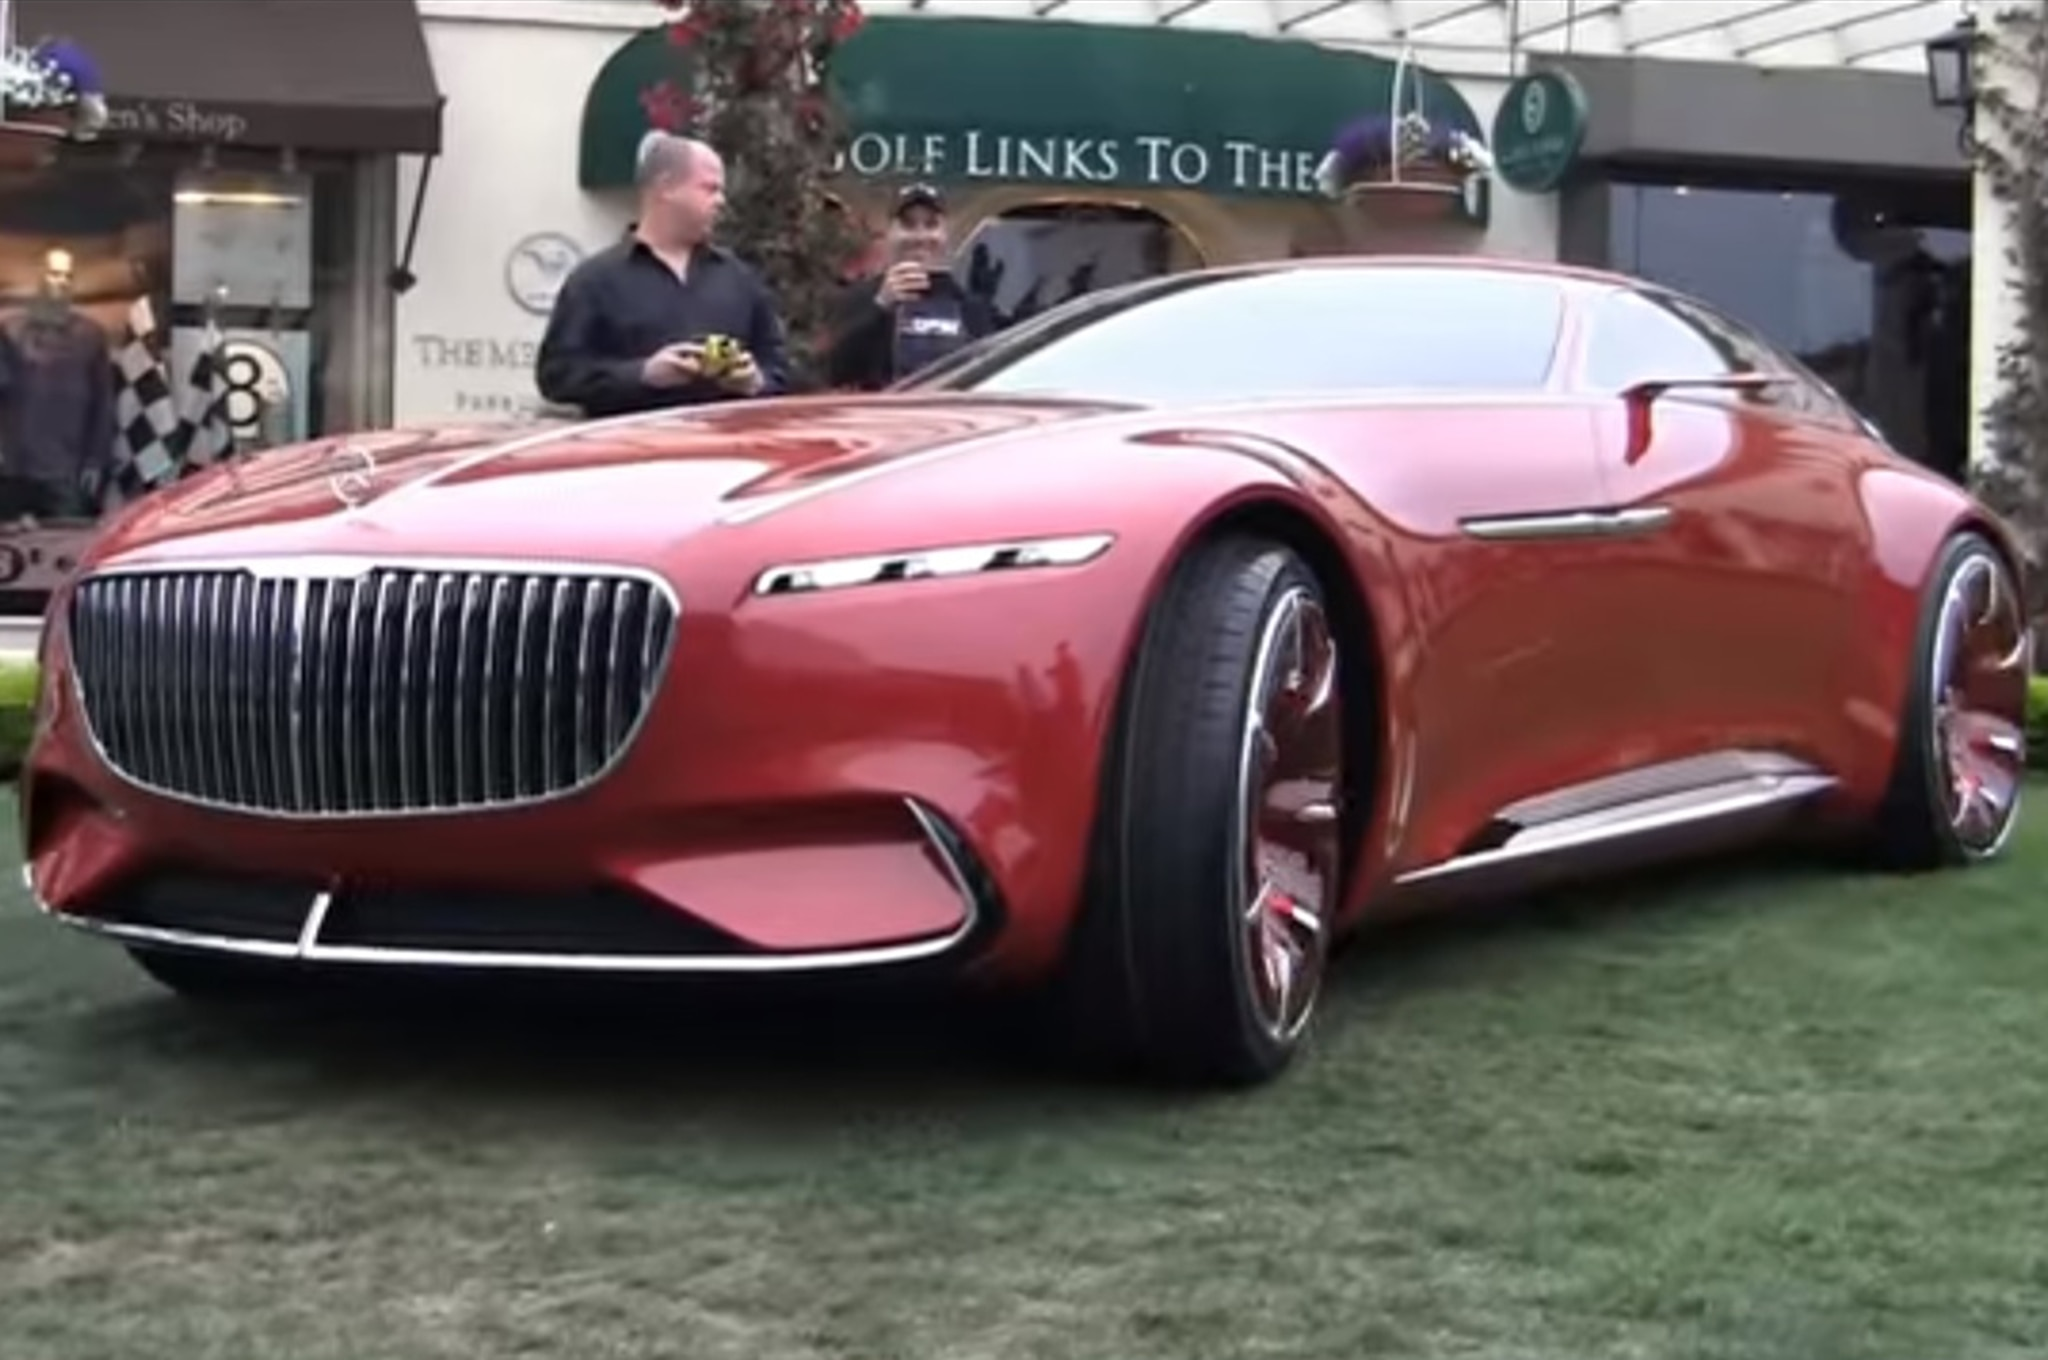 Mercedes Maybach 6 Concept Remote Control